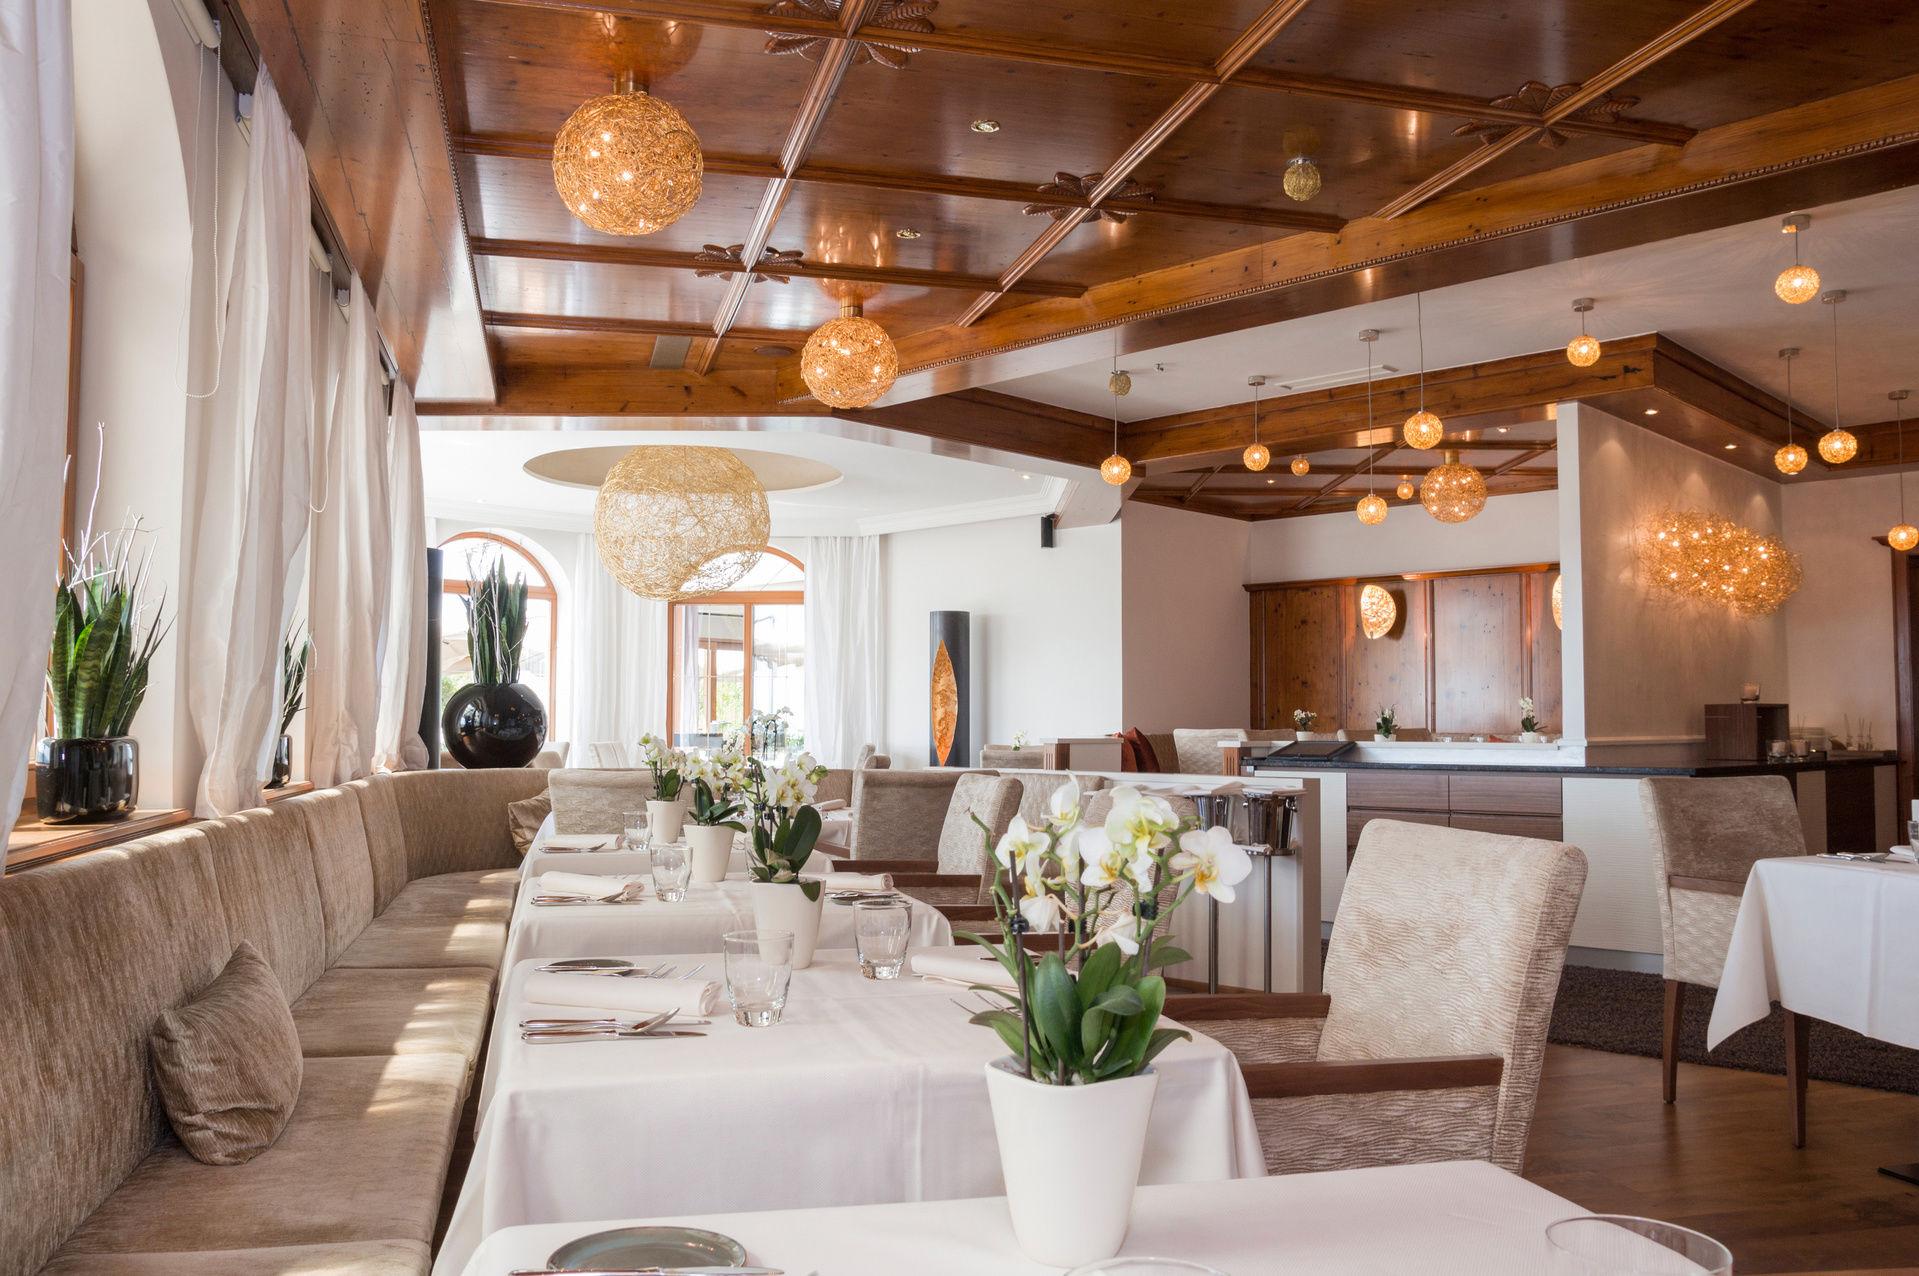 Speisekarte Turmstube Hotel Oberpfalzer Seenland Bayern Hotels